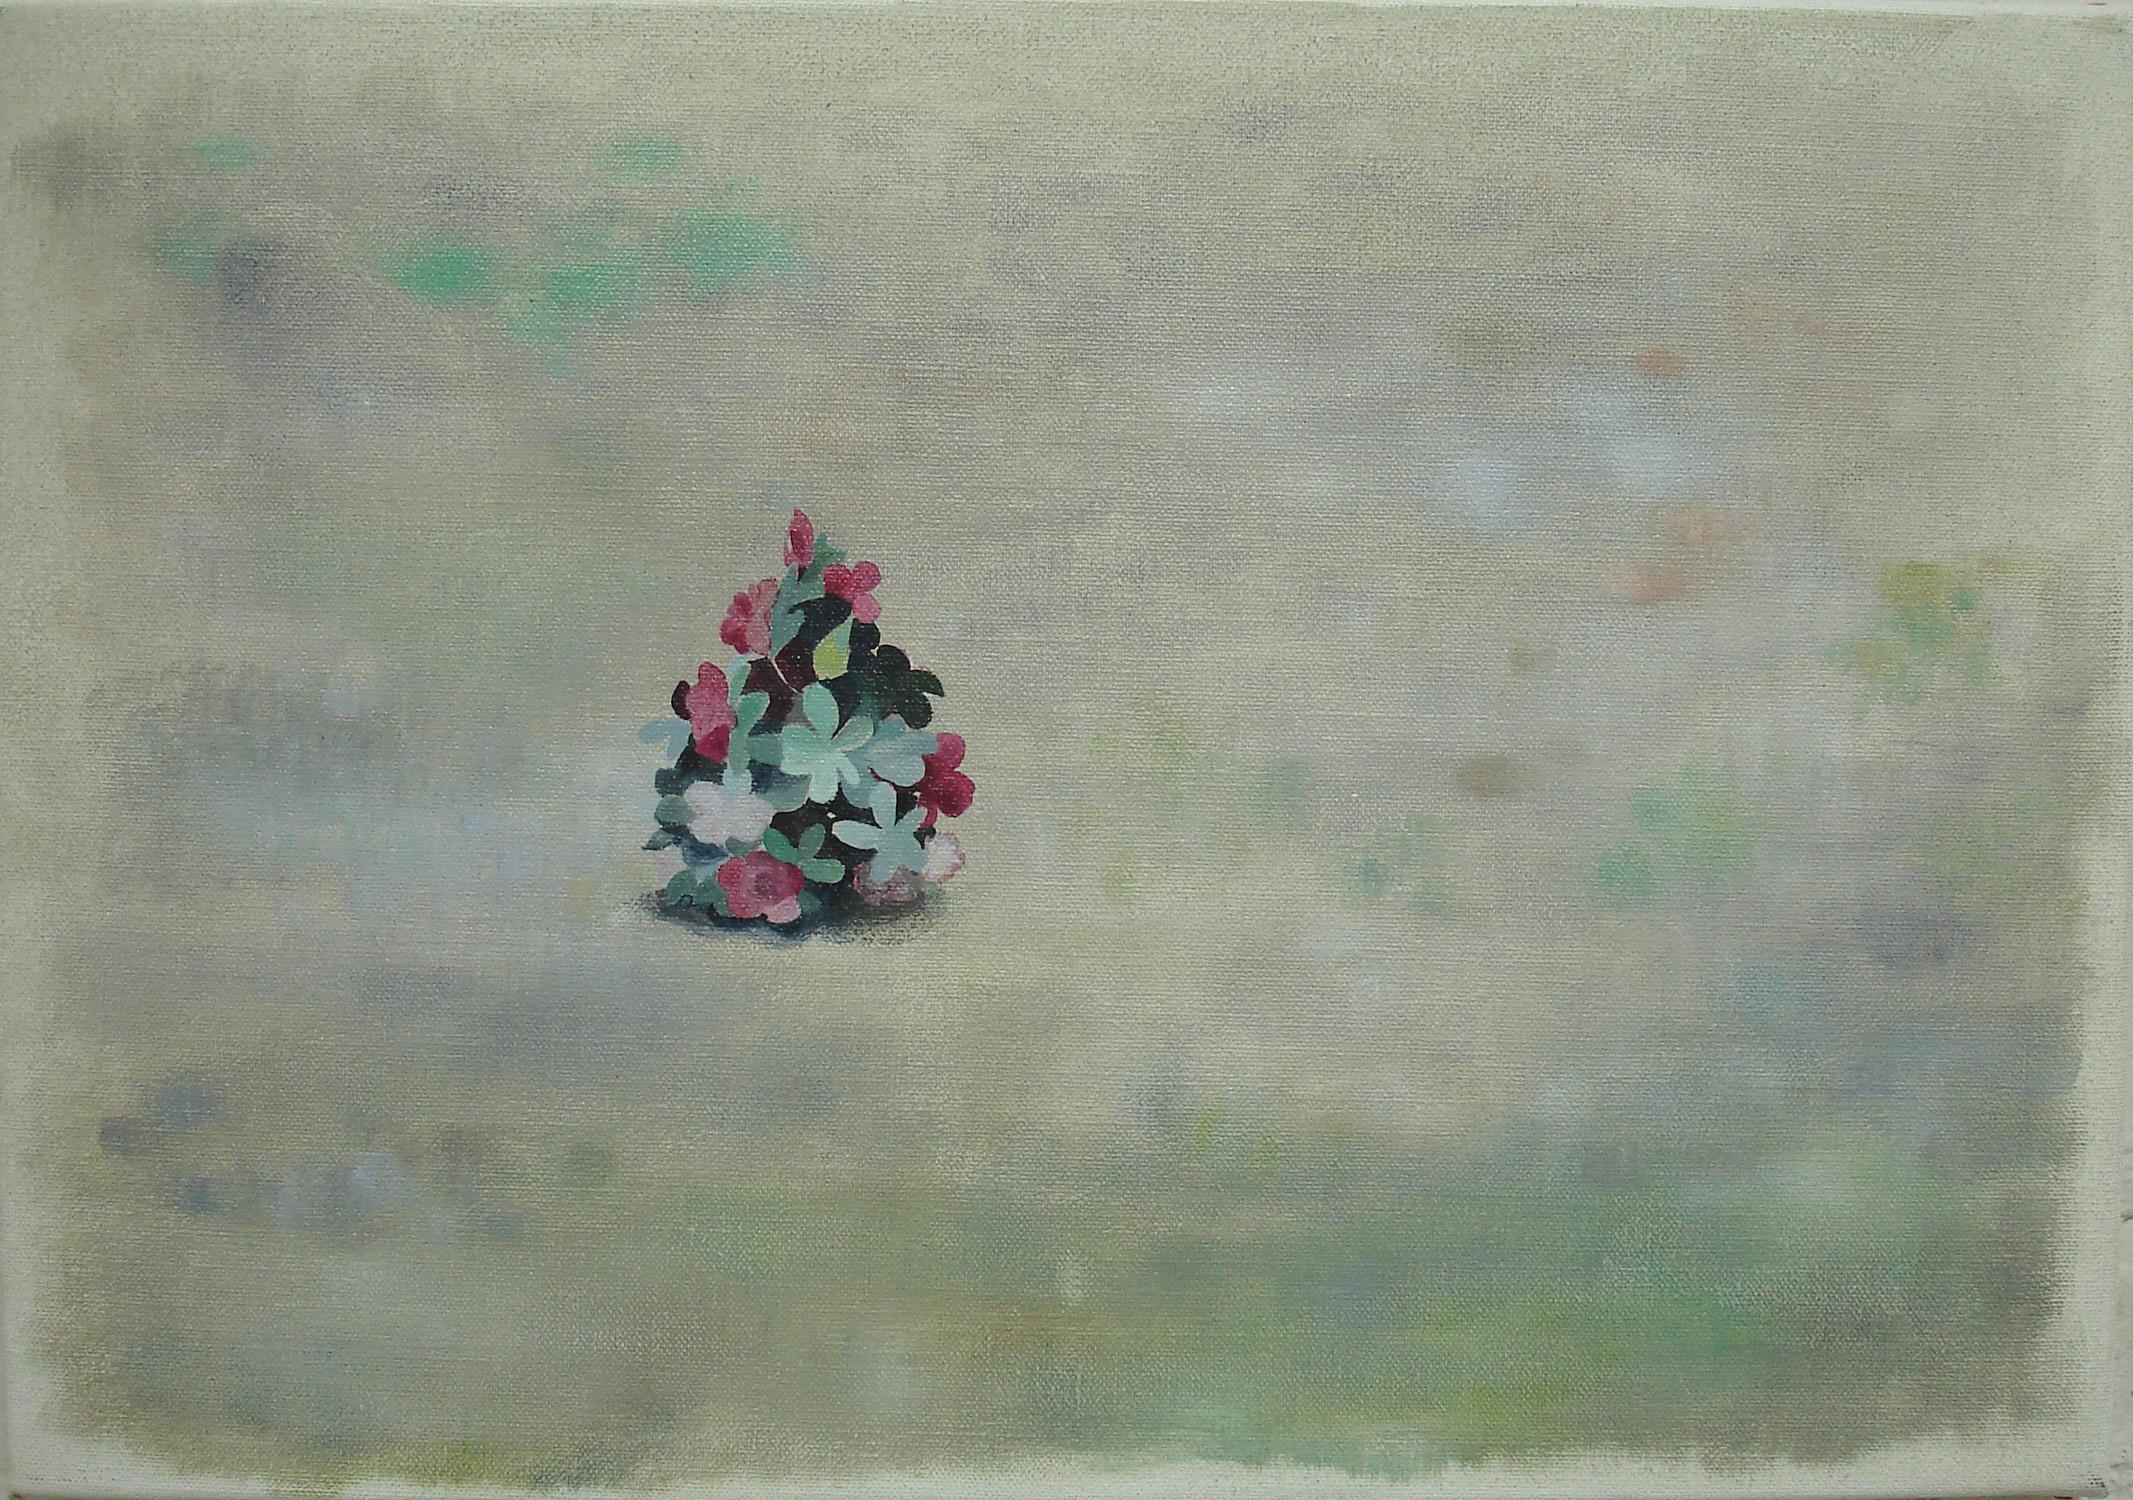 False Plant    2008, oil on canvas, 36 x 50cm